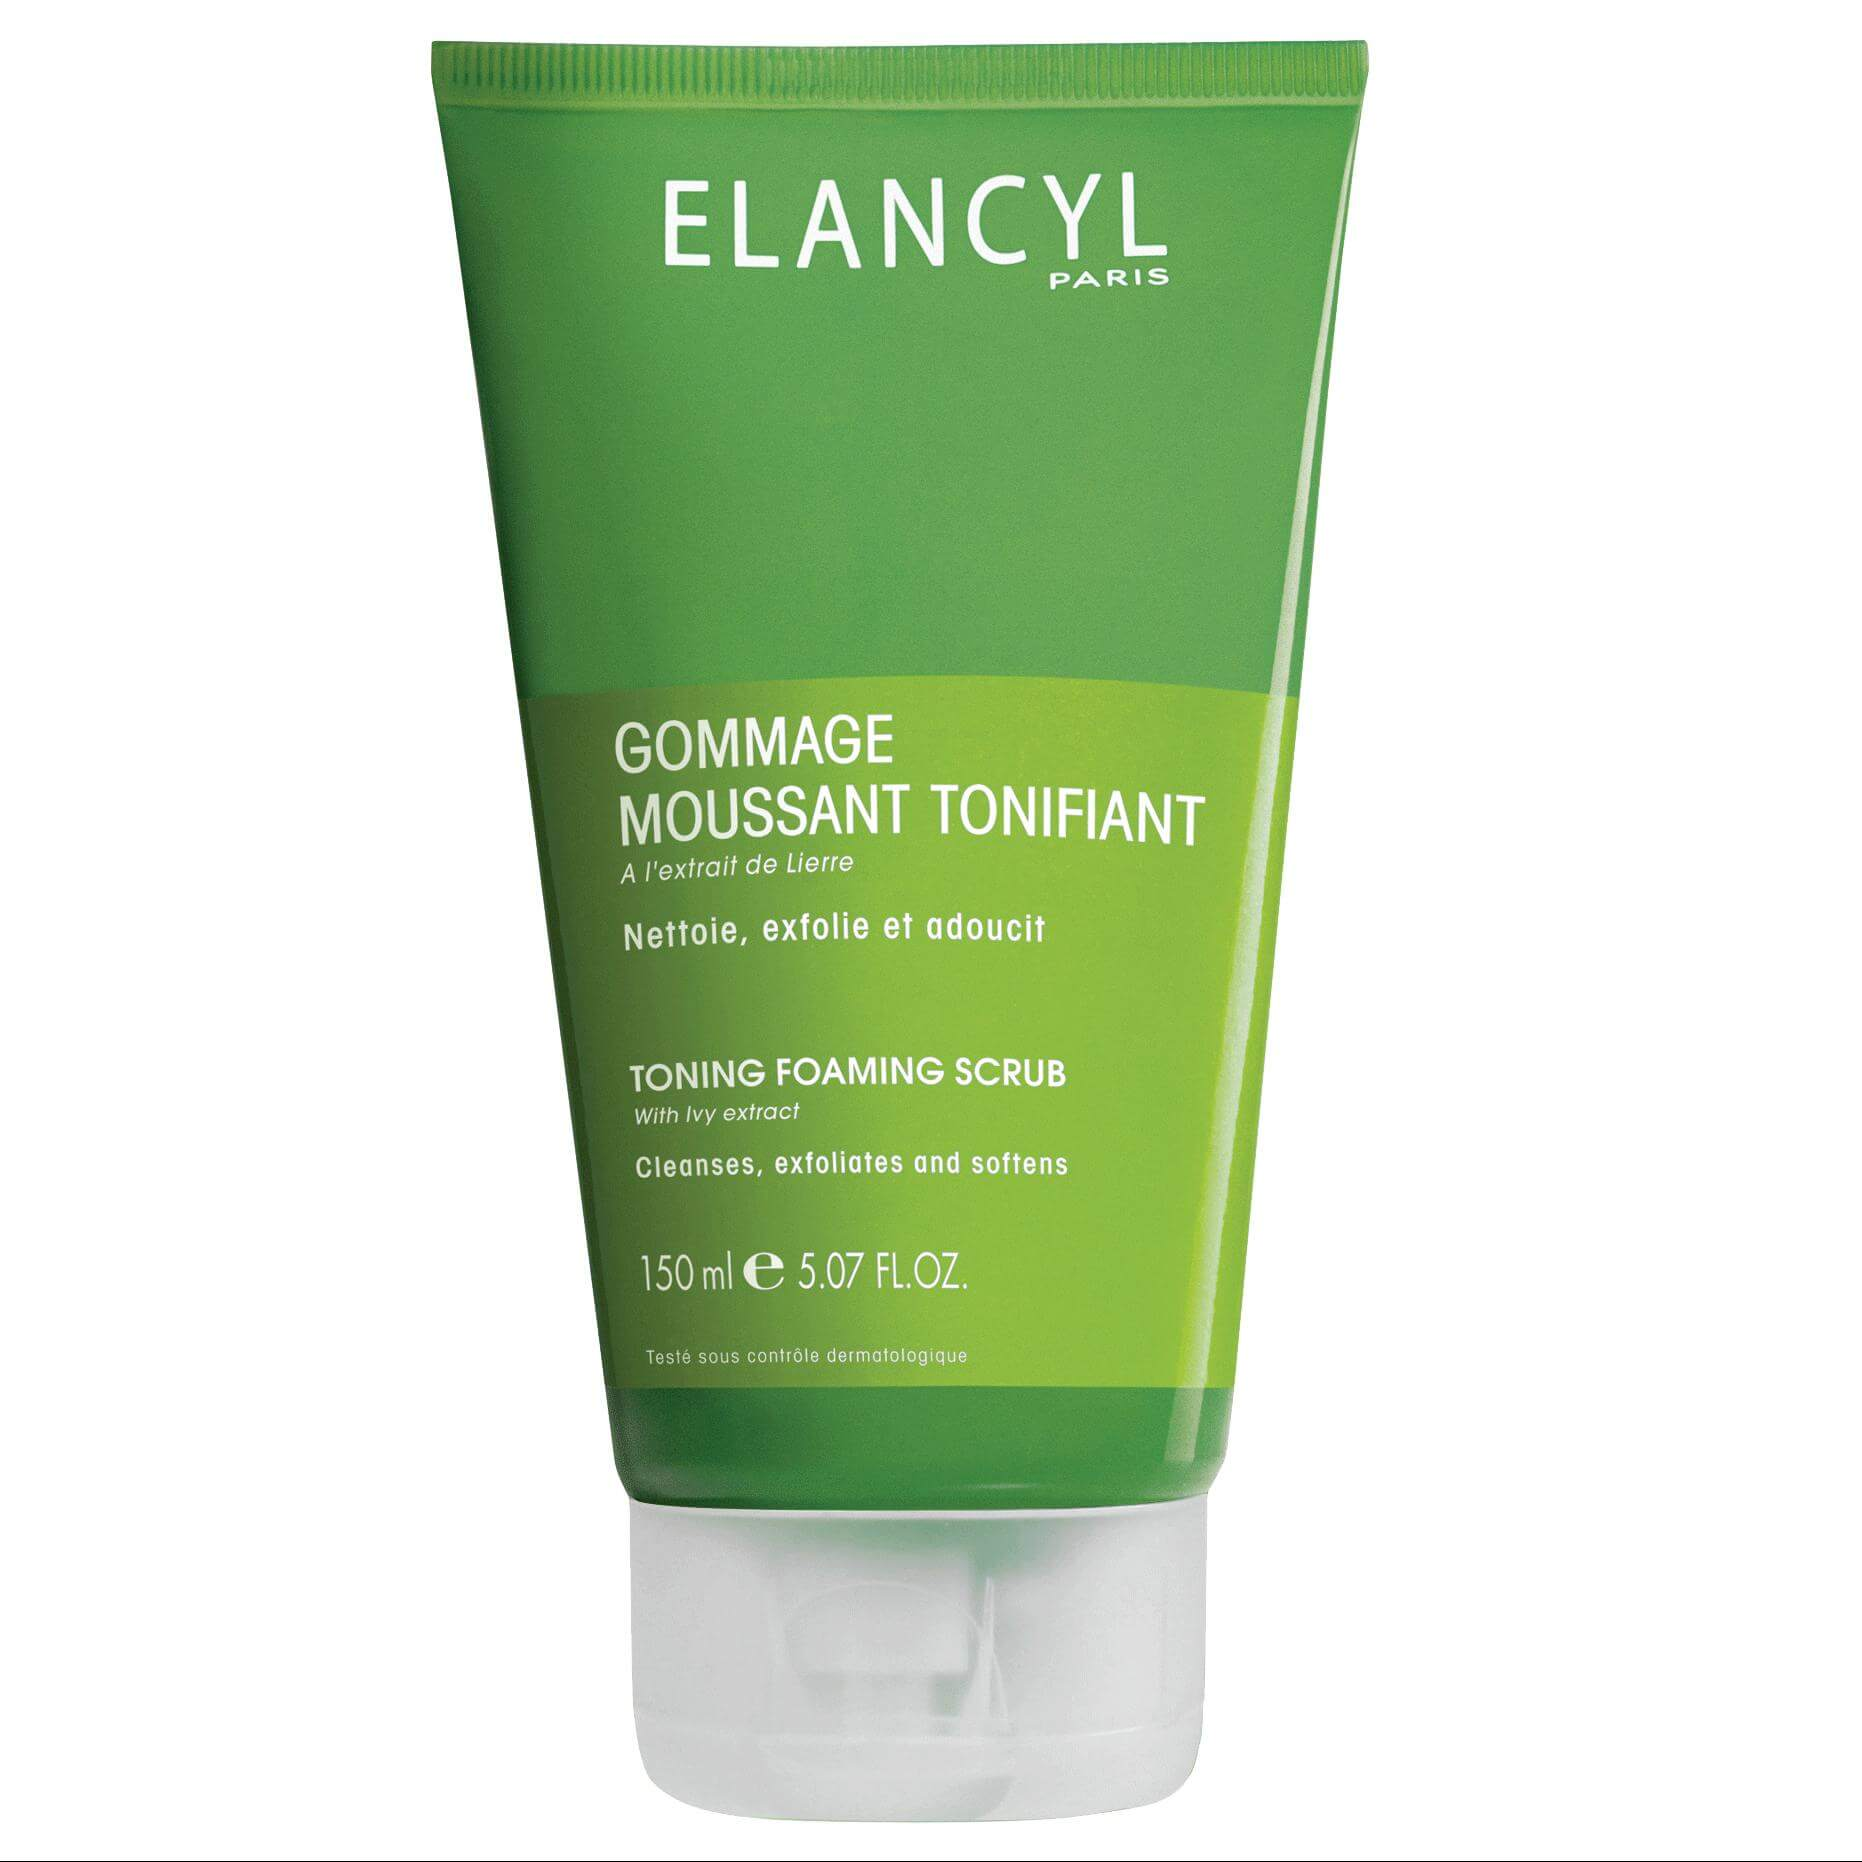 Elancyl Gommage Moussant Tonifiant Scrub Απολέπιση Σώματος 150ml